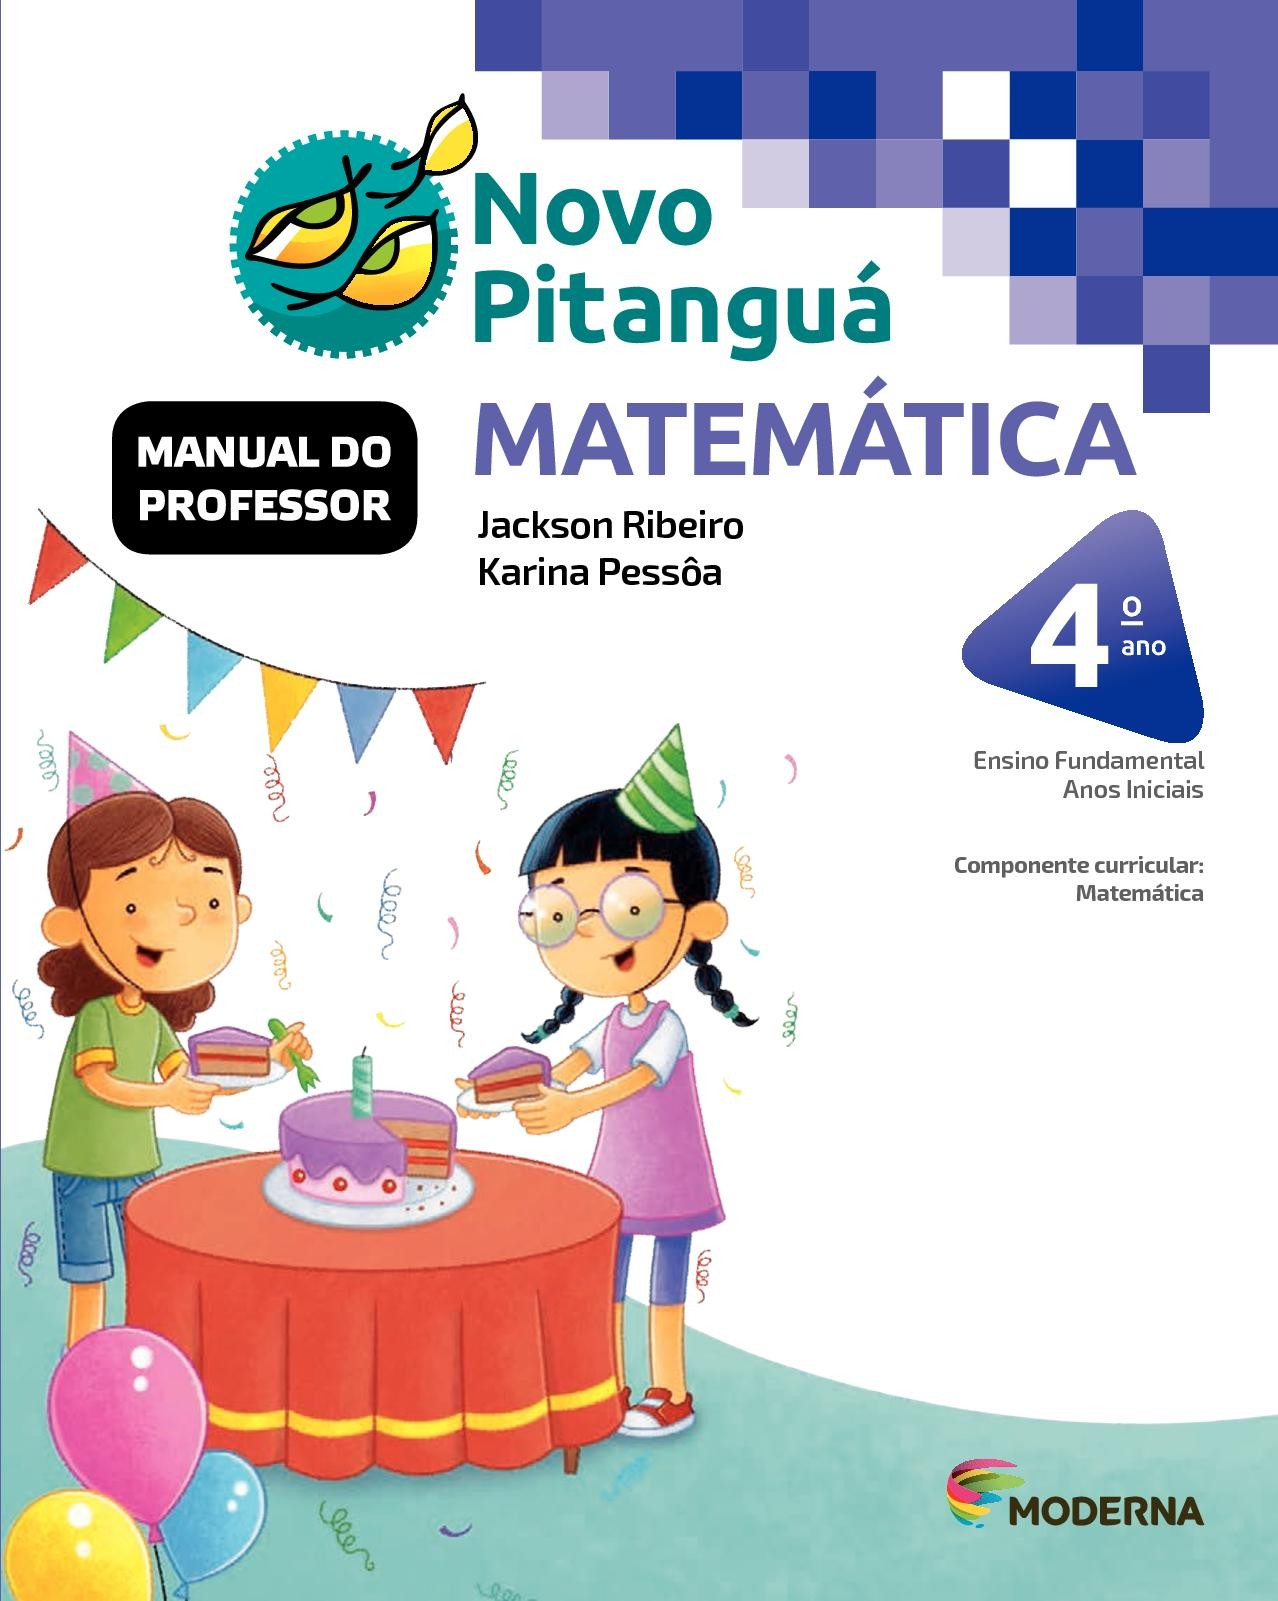 Calendario Agosto 2019 Para Imprimir Para Niños Más Recientes Calaméo Novo Pitangu Matemática 4º Ano